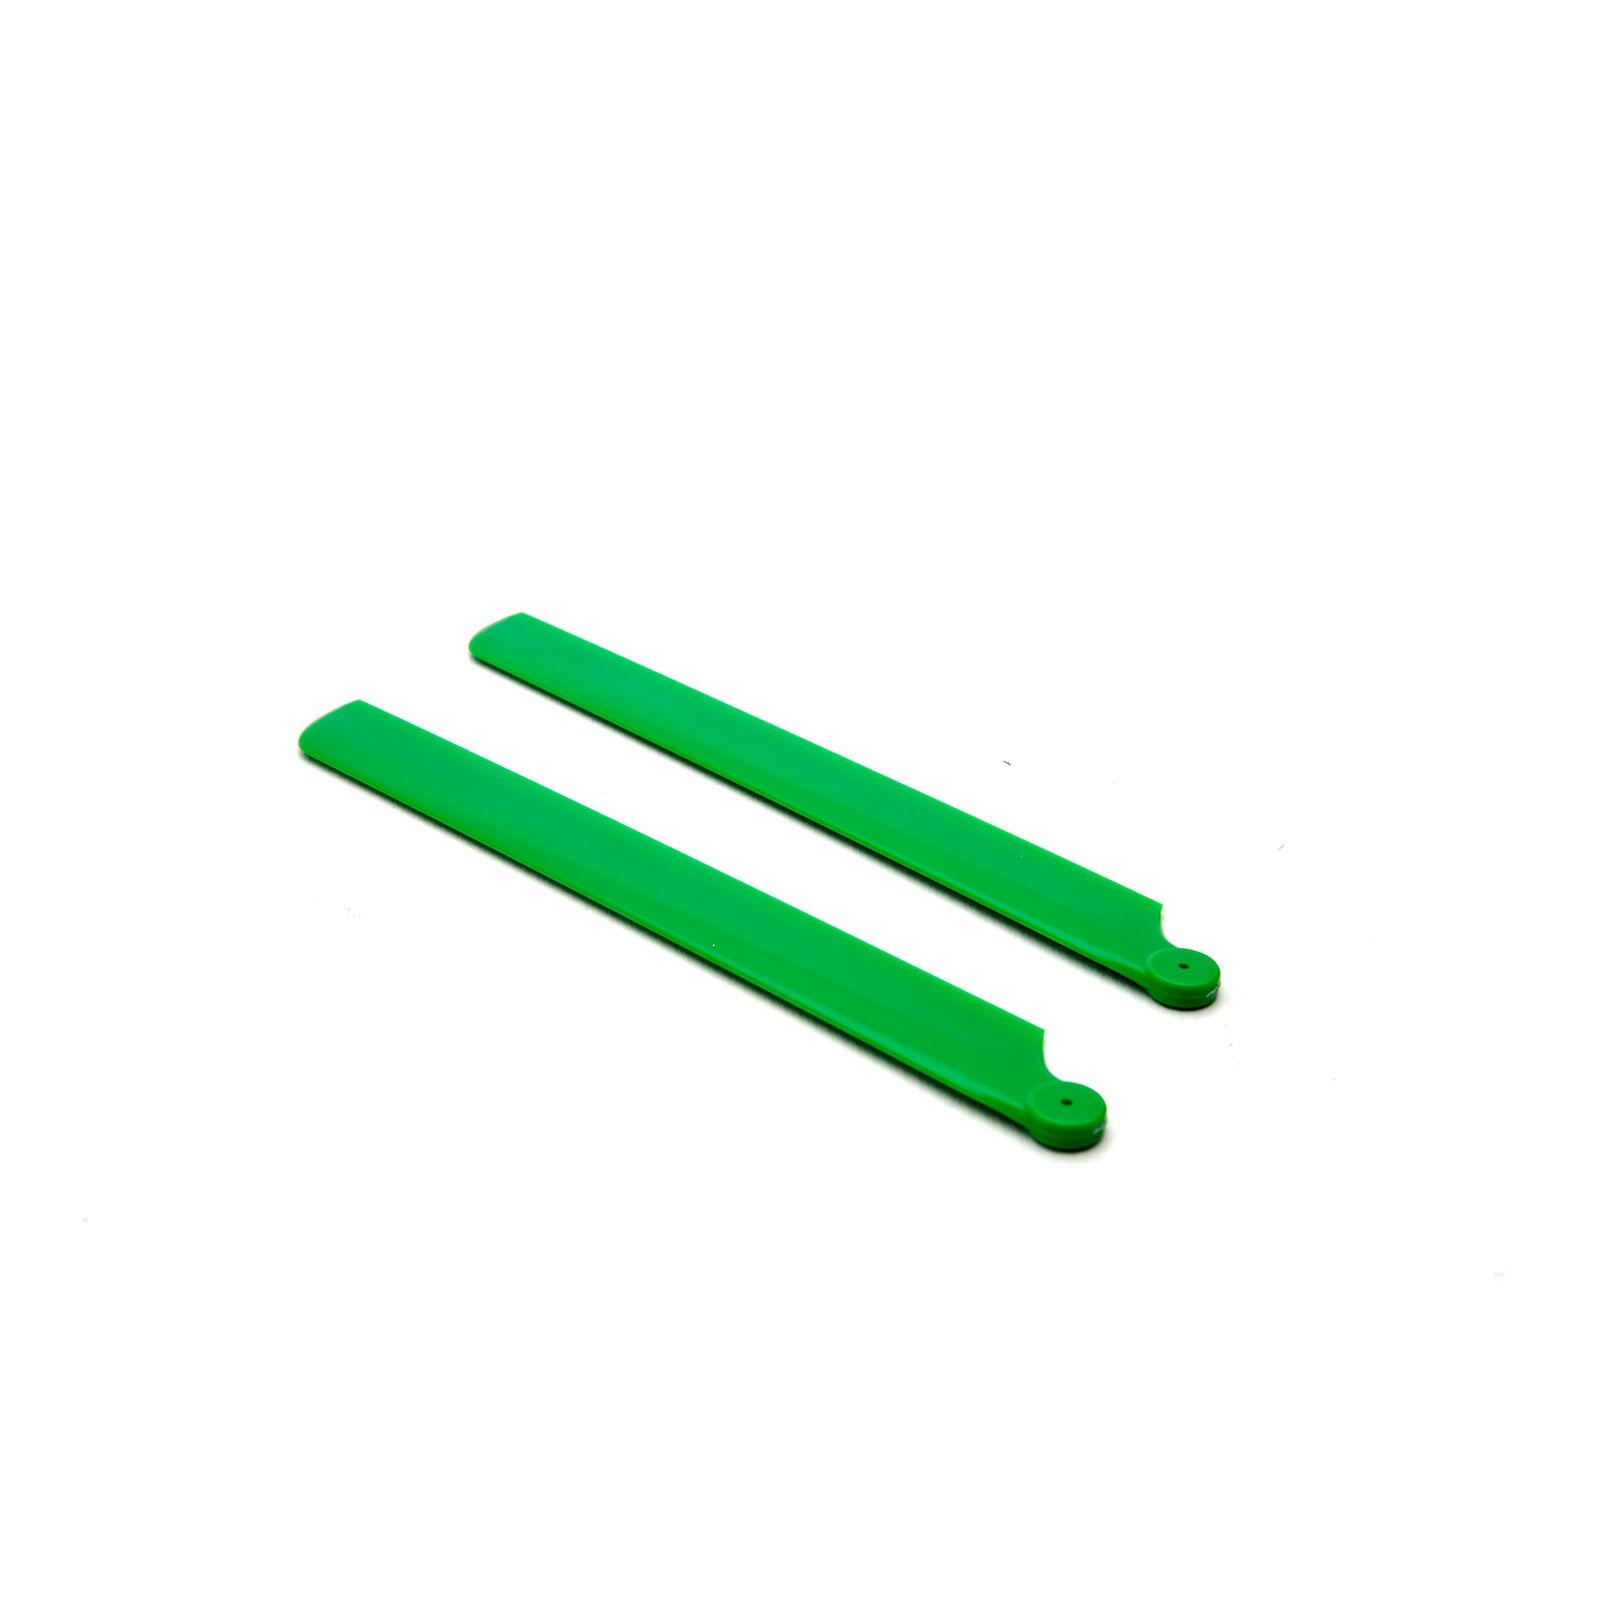 Main Rotor Blade Set, Green: Blade 230 S